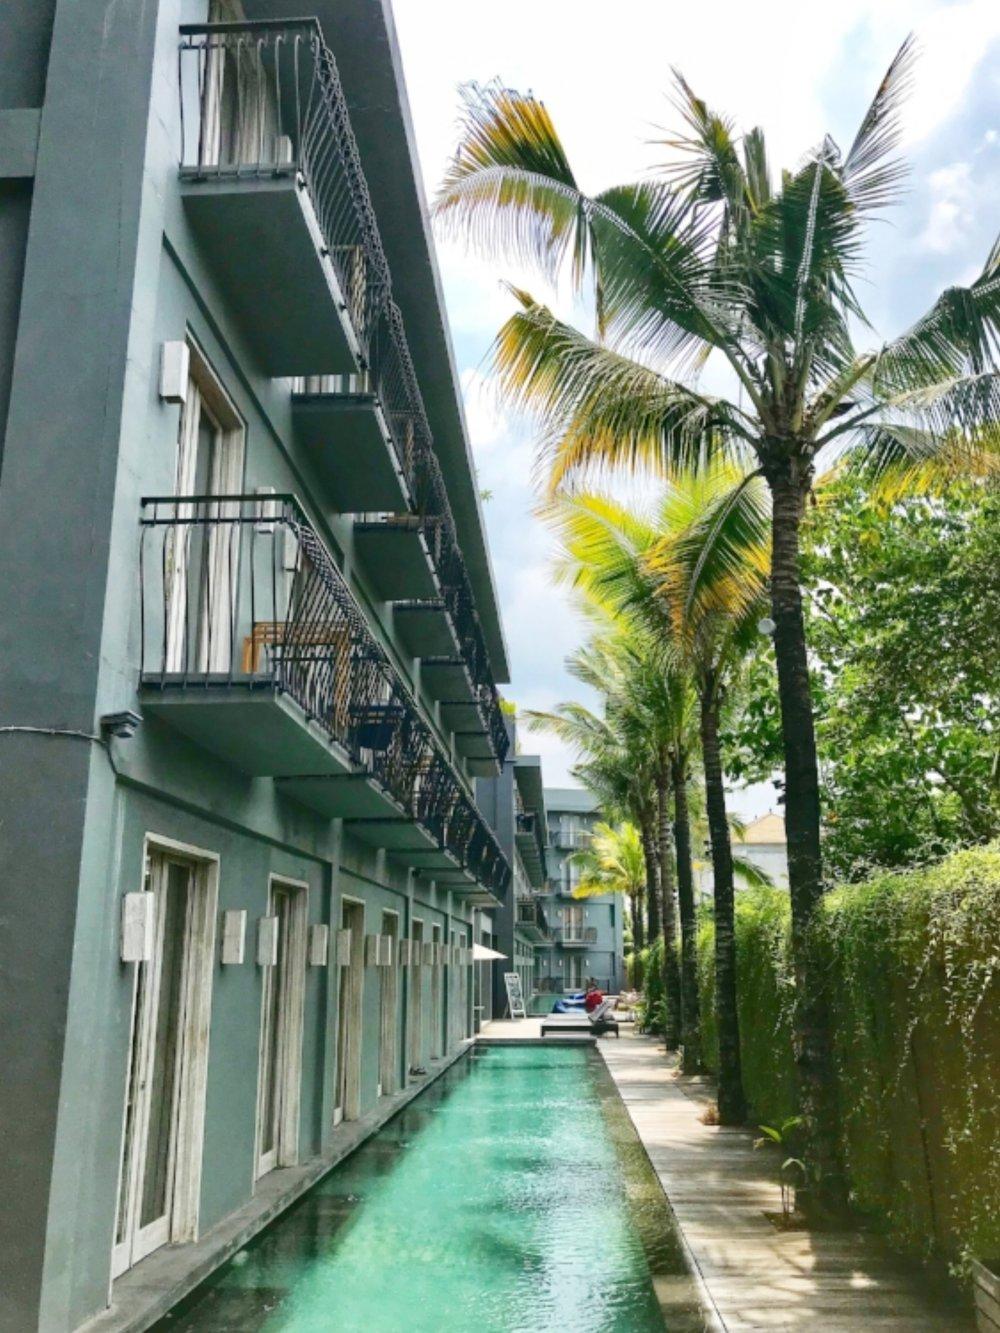 FRii Hotel in Canggu Bali affordable accommodation